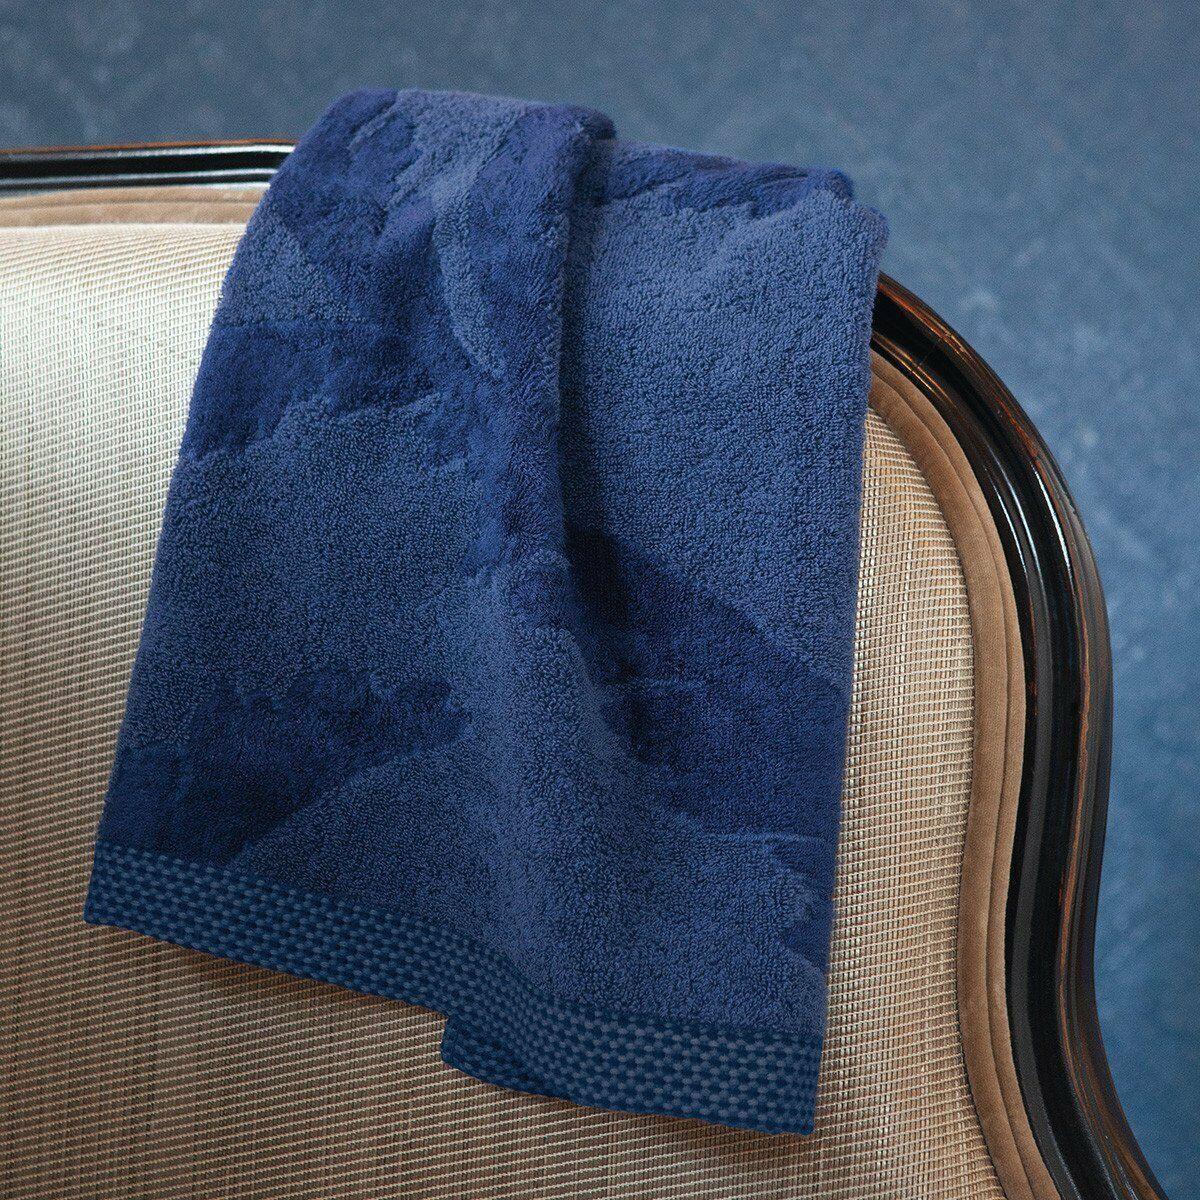 FRANCE YVES DELORME PALMIO SAPPHIRE Blau BATH TOWEL IN FLORAL DESIGN